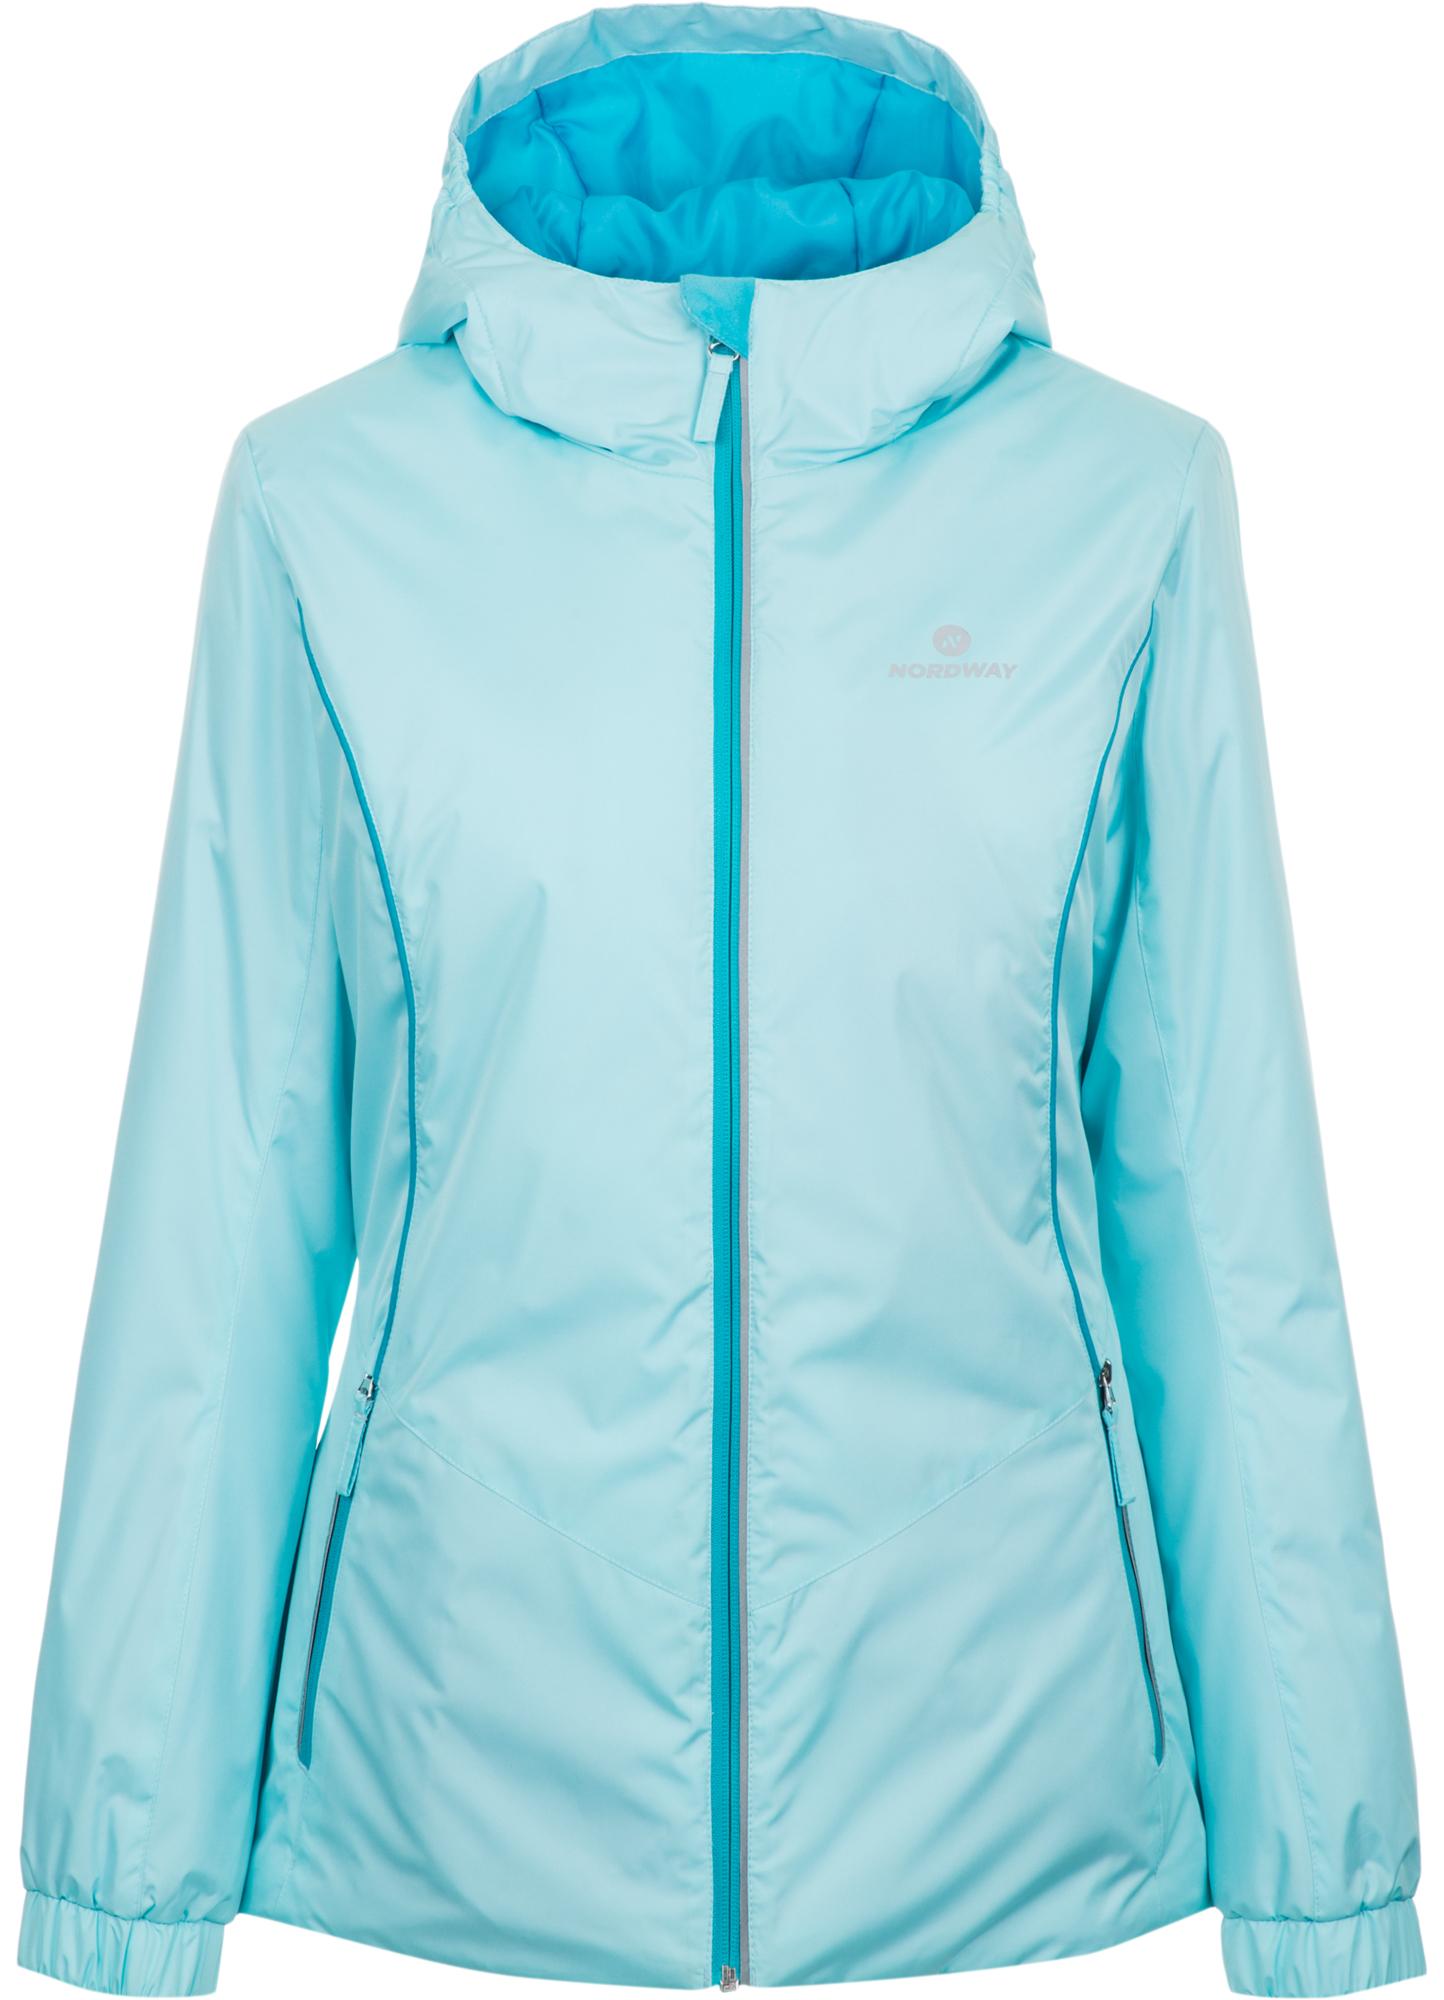 Nordway Куртка утепленная женская Nordway, размер 42 nordway nordway laval взрослые размер 42